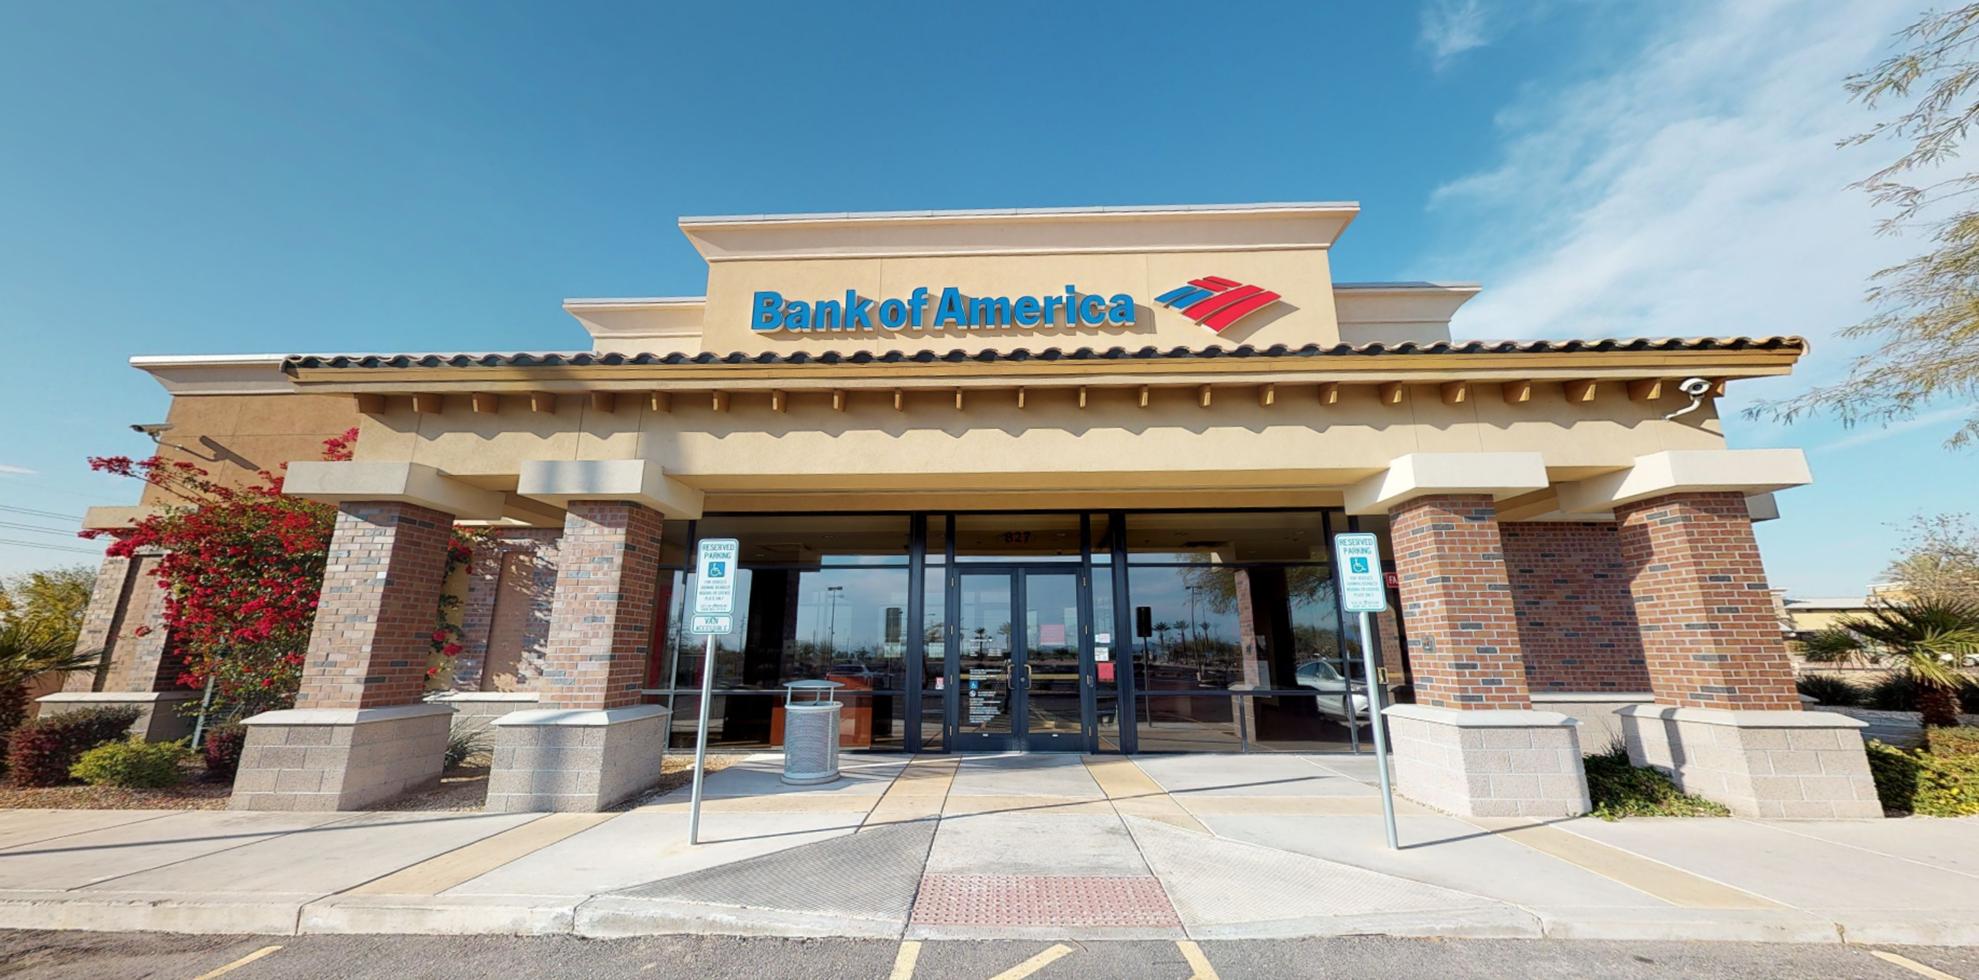 Bank of America financial center with drive-thru ATM | 827 S Cotton Ln, Goodyear, AZ 85338